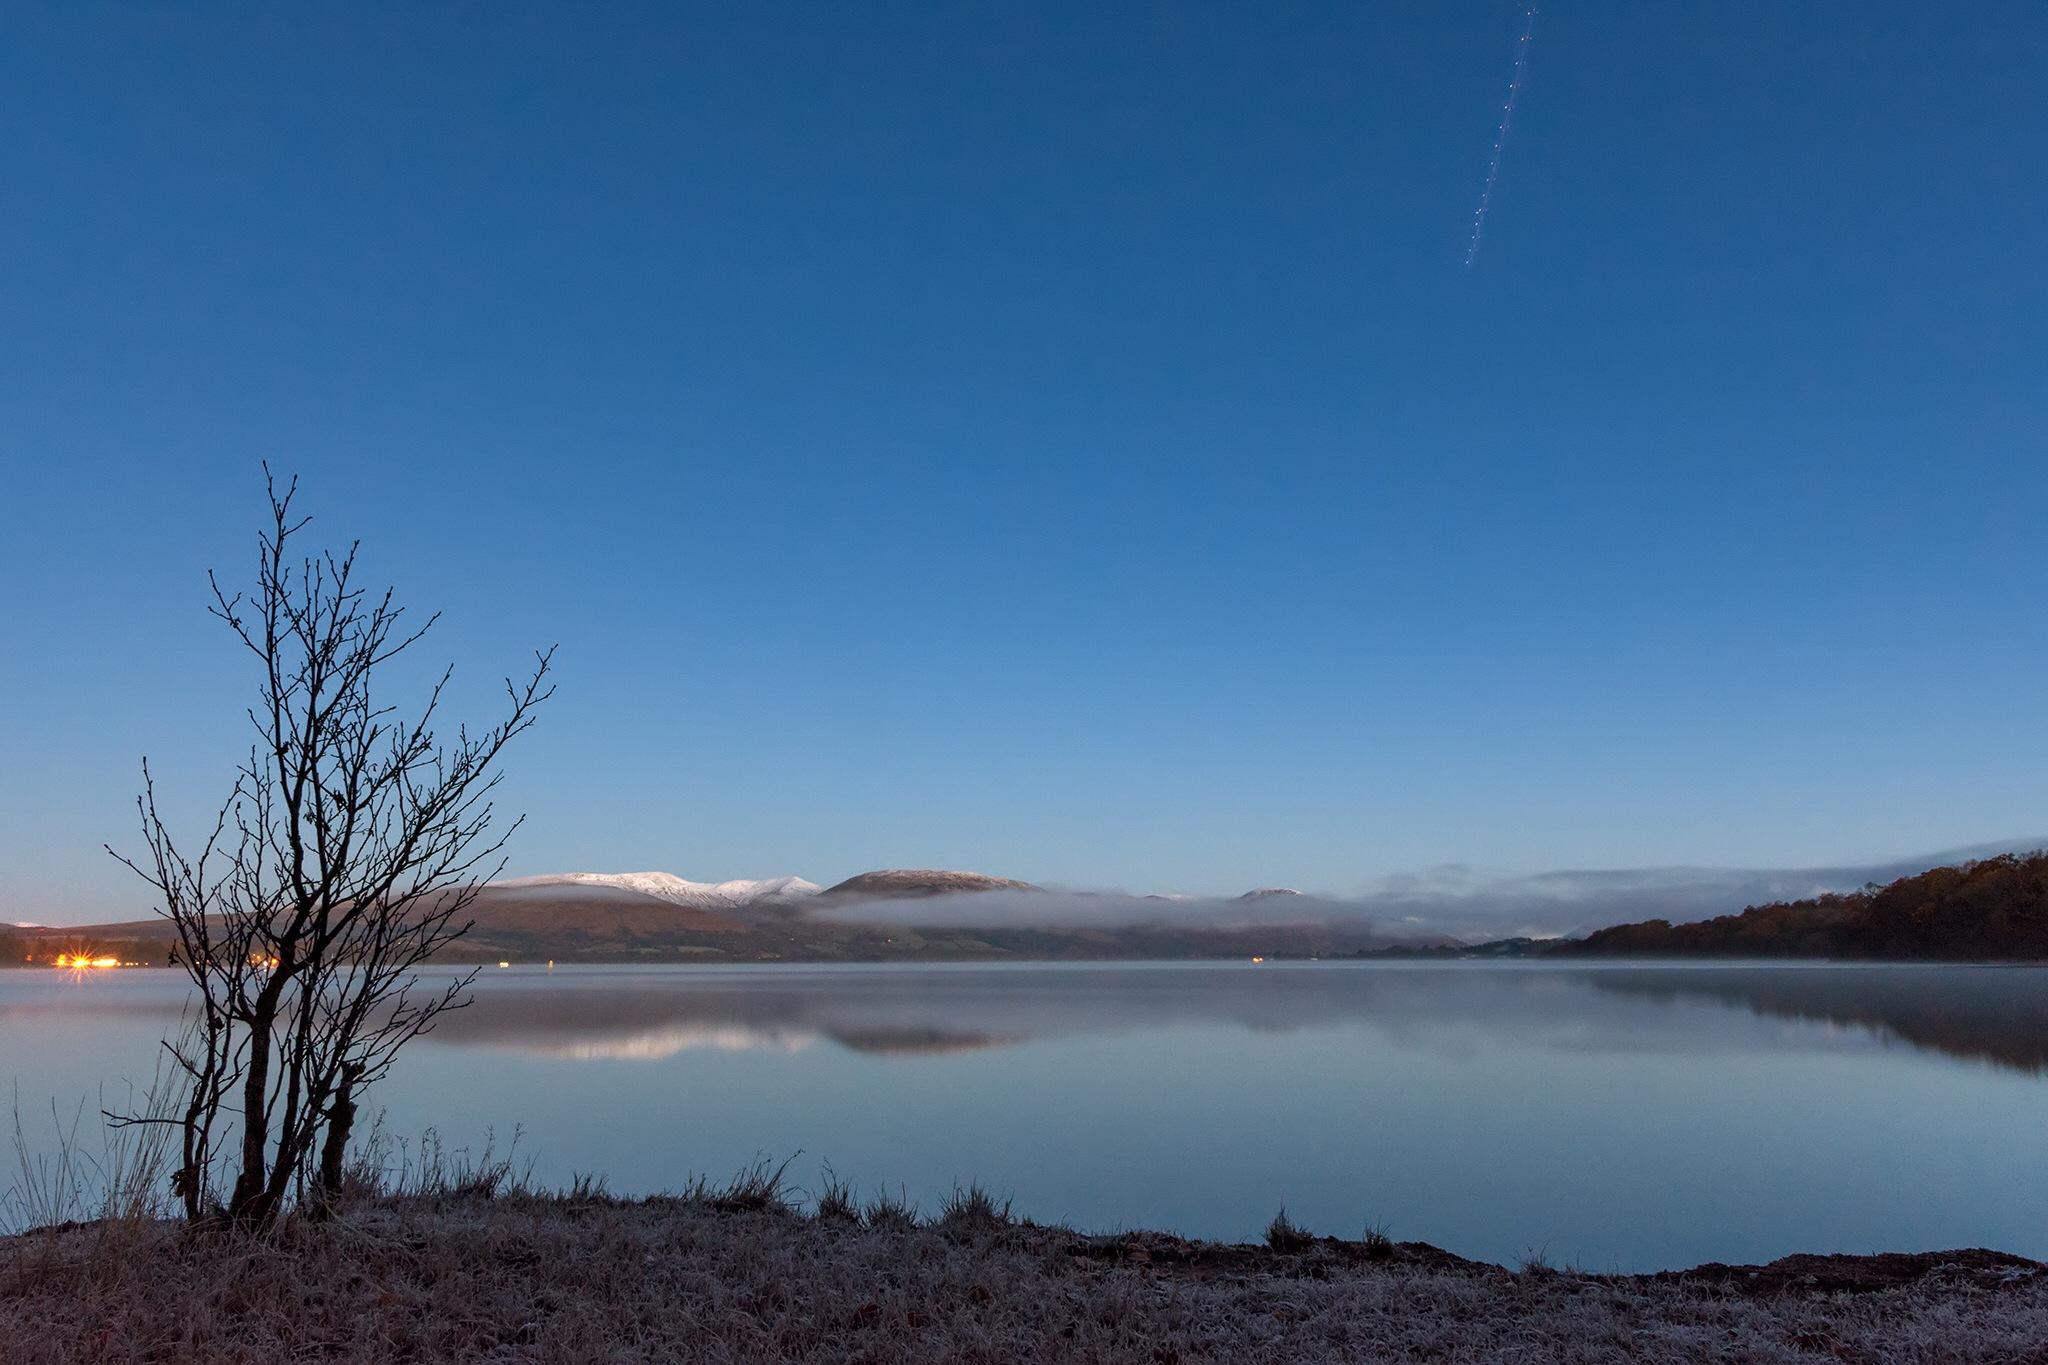 Early morning Loch Lomond  by Gary Ellis